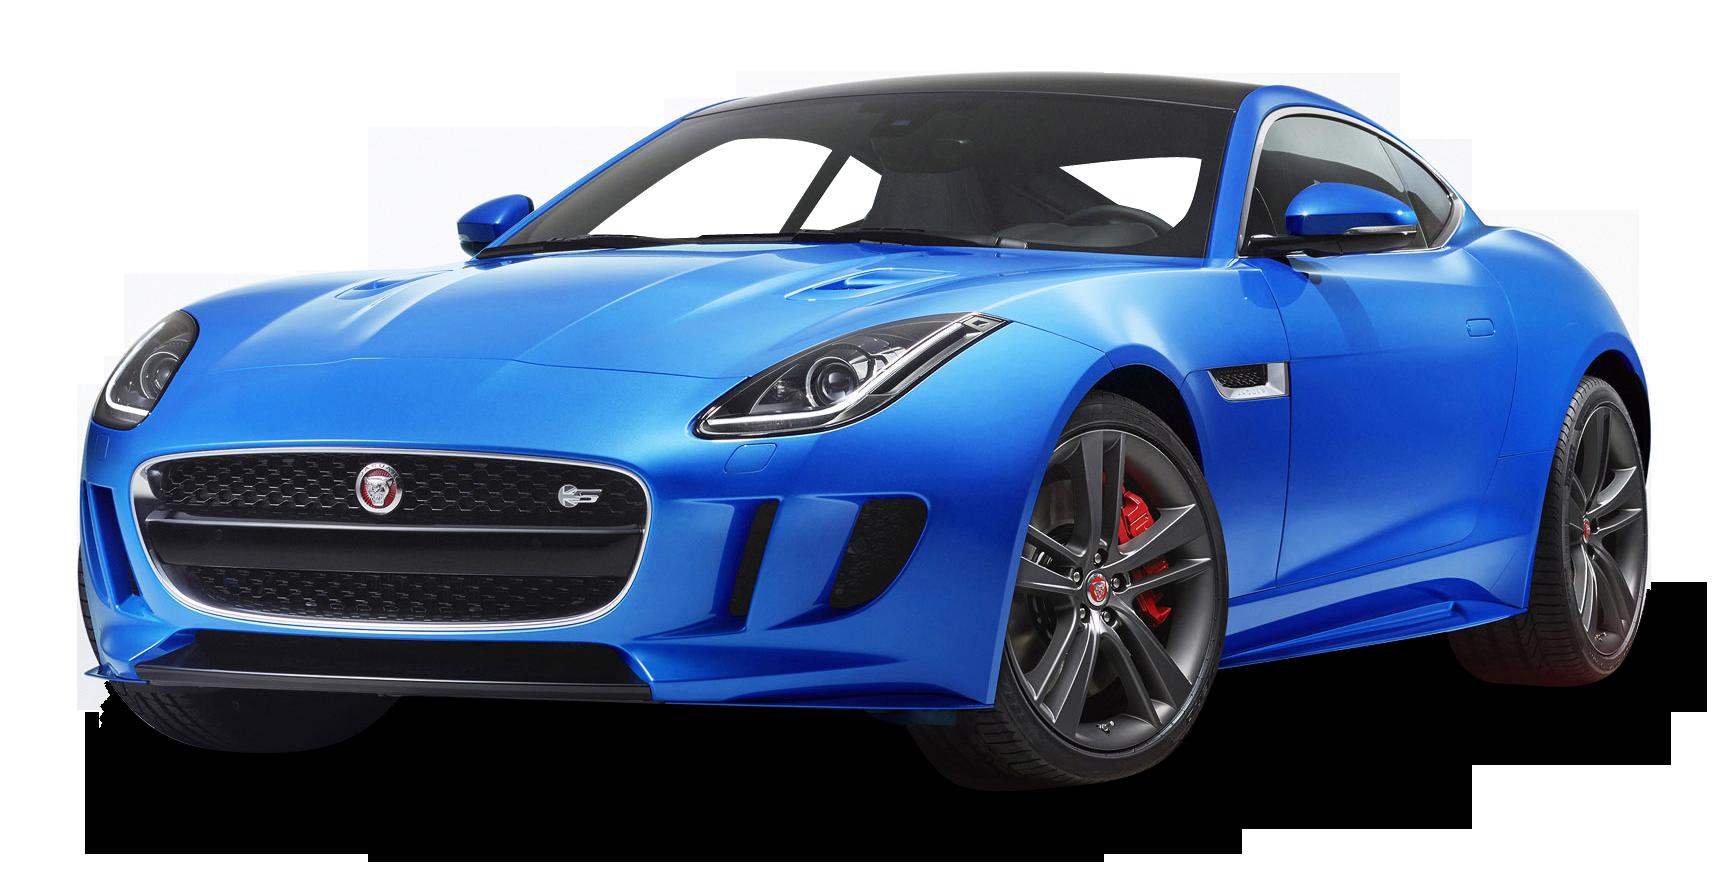 Blue Jaguar F Type Luxury Sports Car Png Image Purepng Free